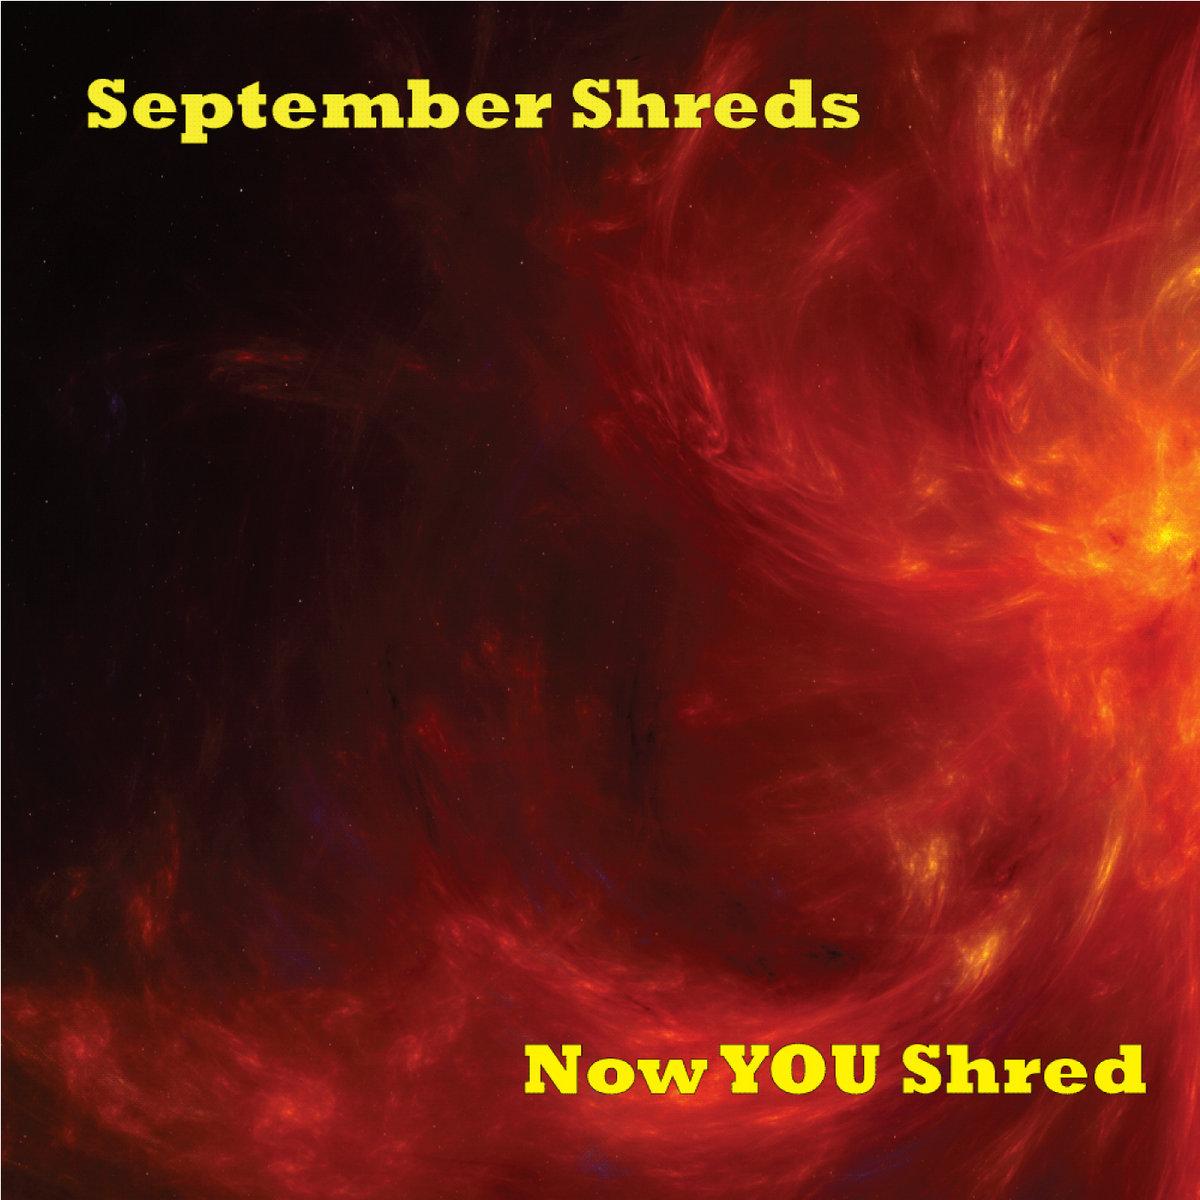 Slow Psychedelic Reggae Rock [C# Aeolian - 59 bpm] | Now YOU Shred